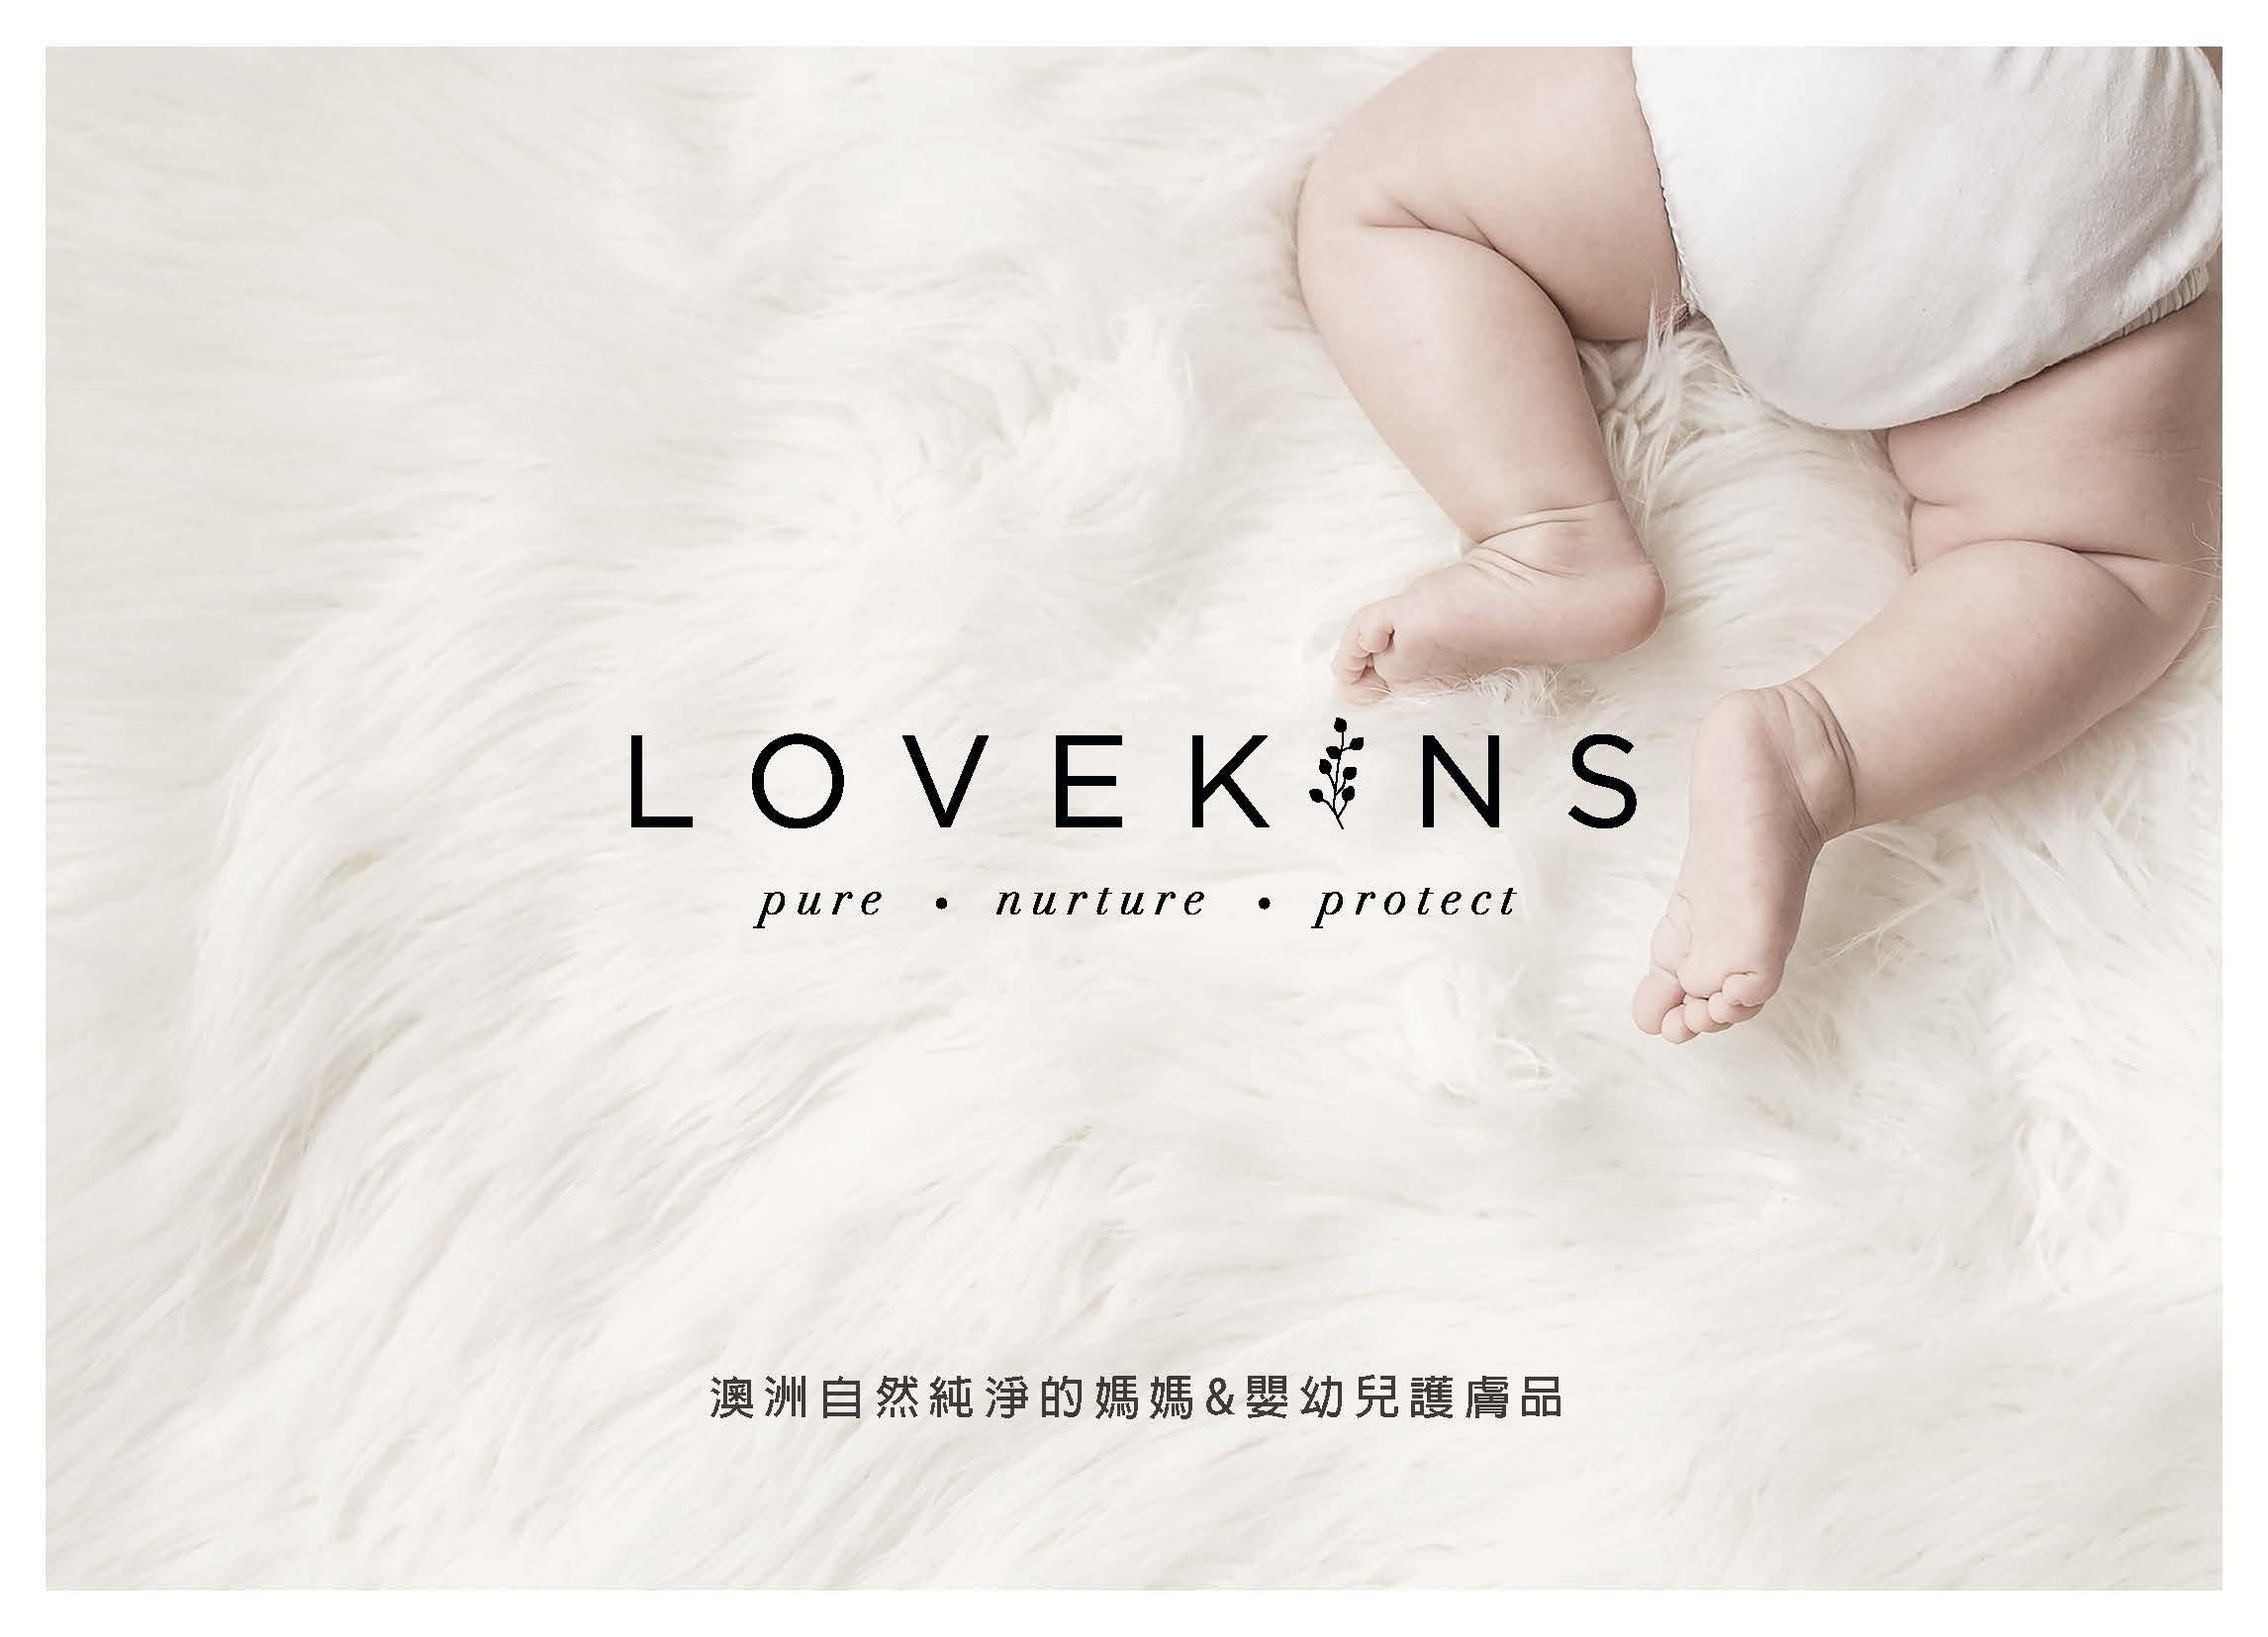 Lovekins Company Presentation_頁面_01.jpg